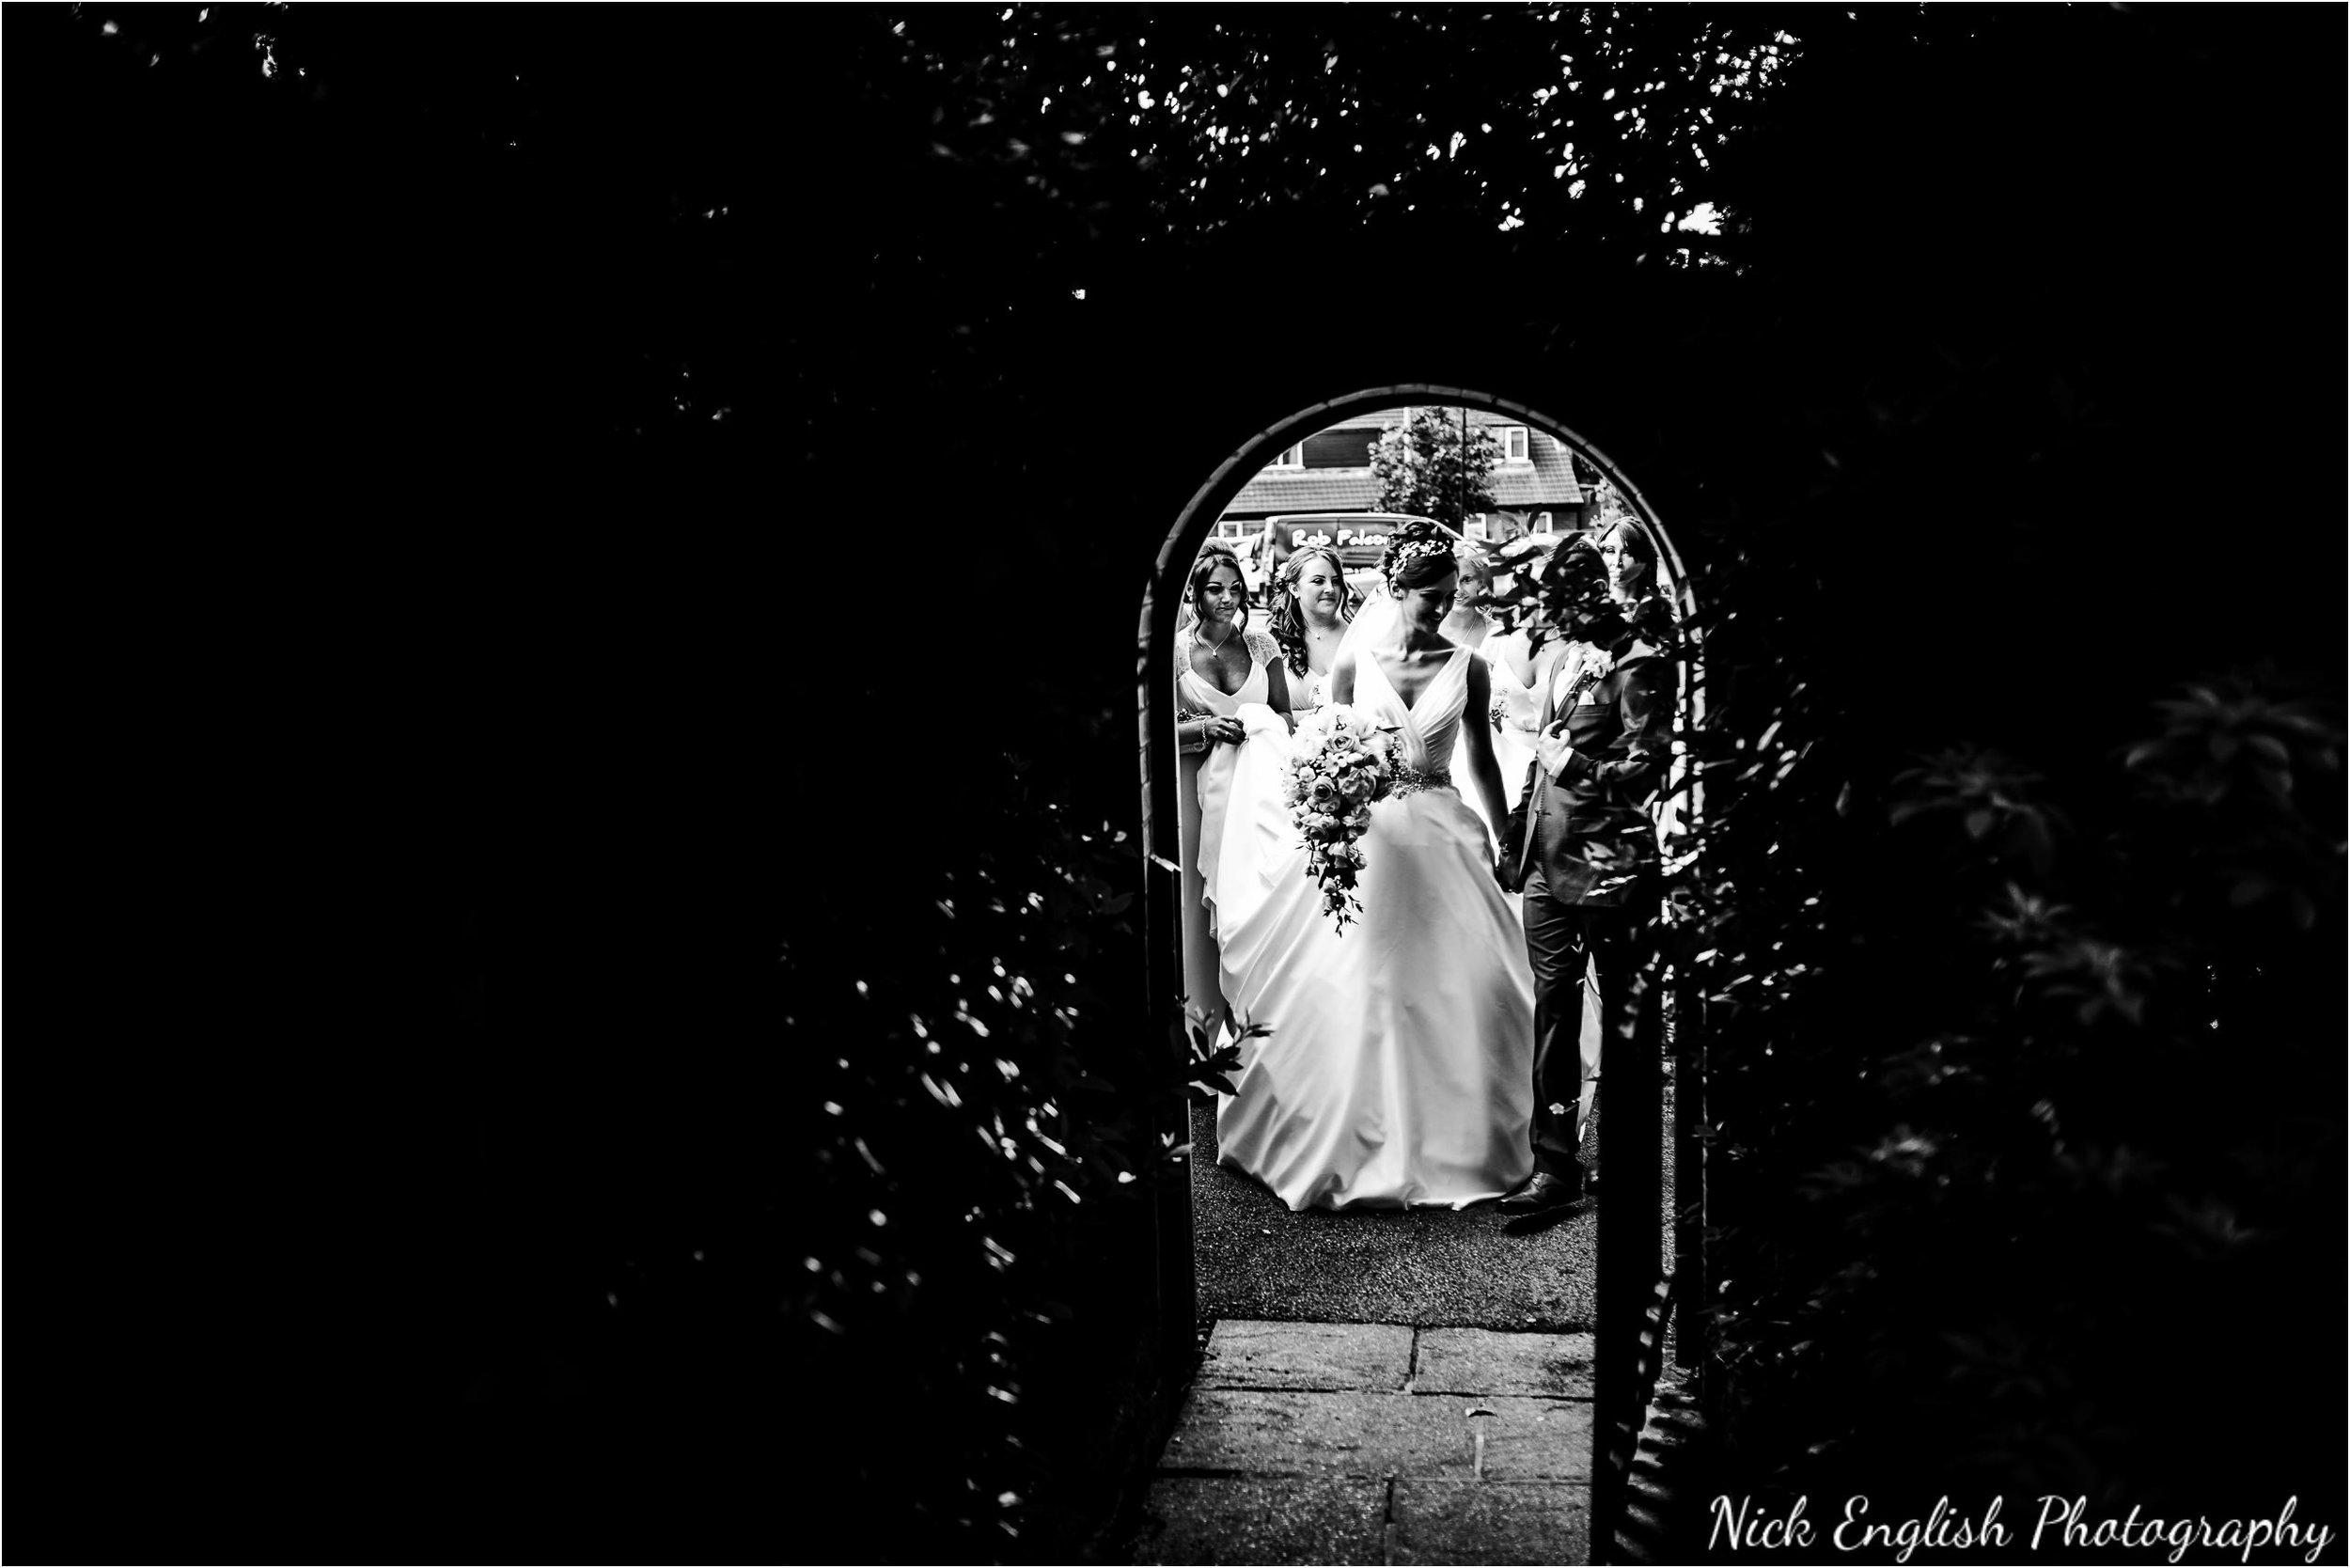 Emily David Wedding Photographs at Barton Grange Preston by Nick English Photography 88jpg.jpeg